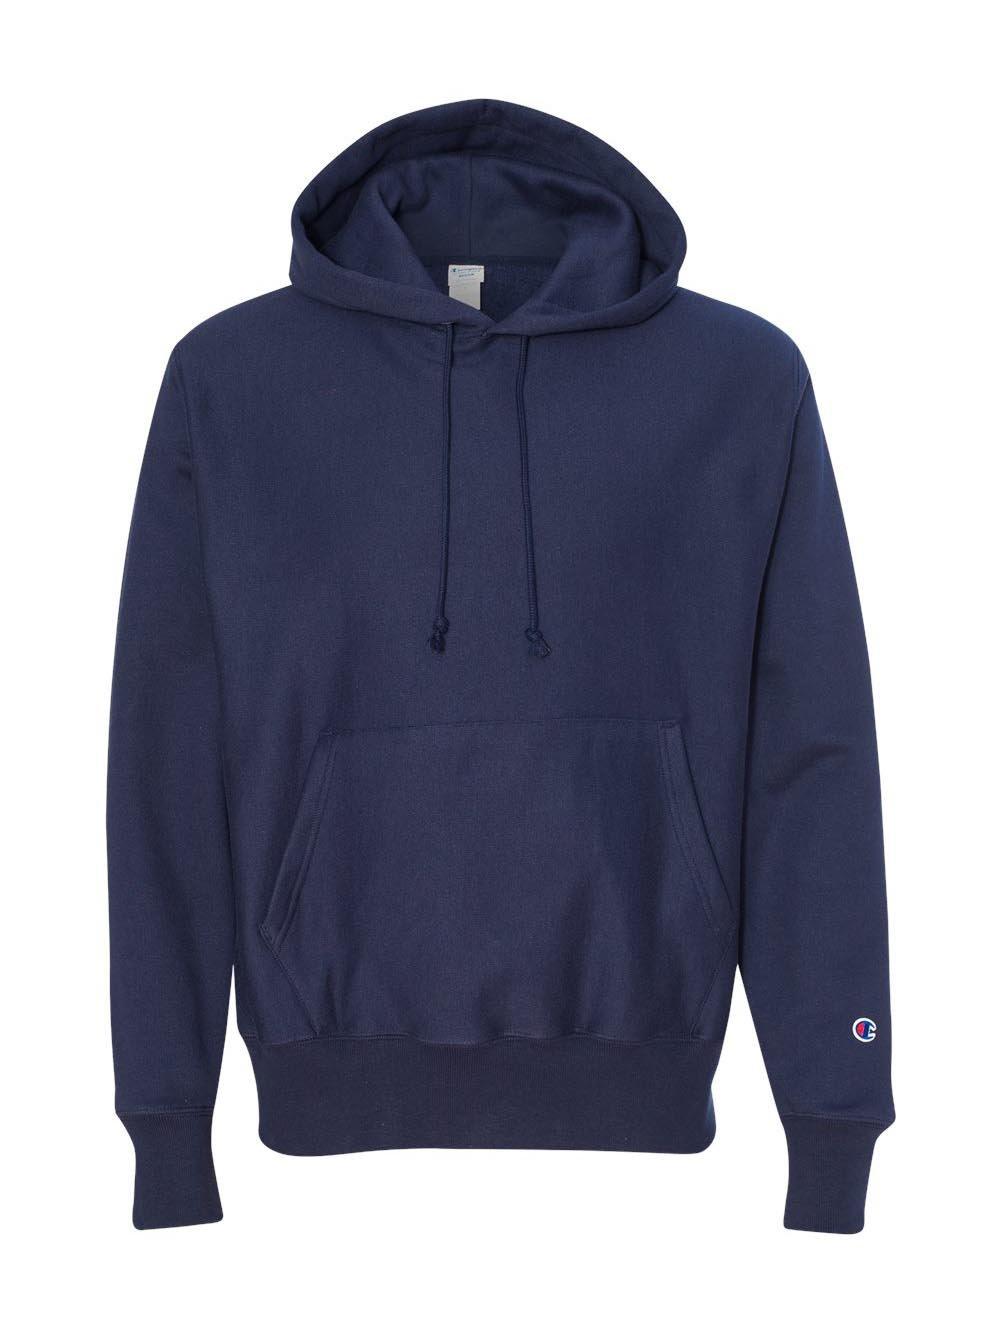 Champion Reverse Weave Hood S101, XL, Team Navy